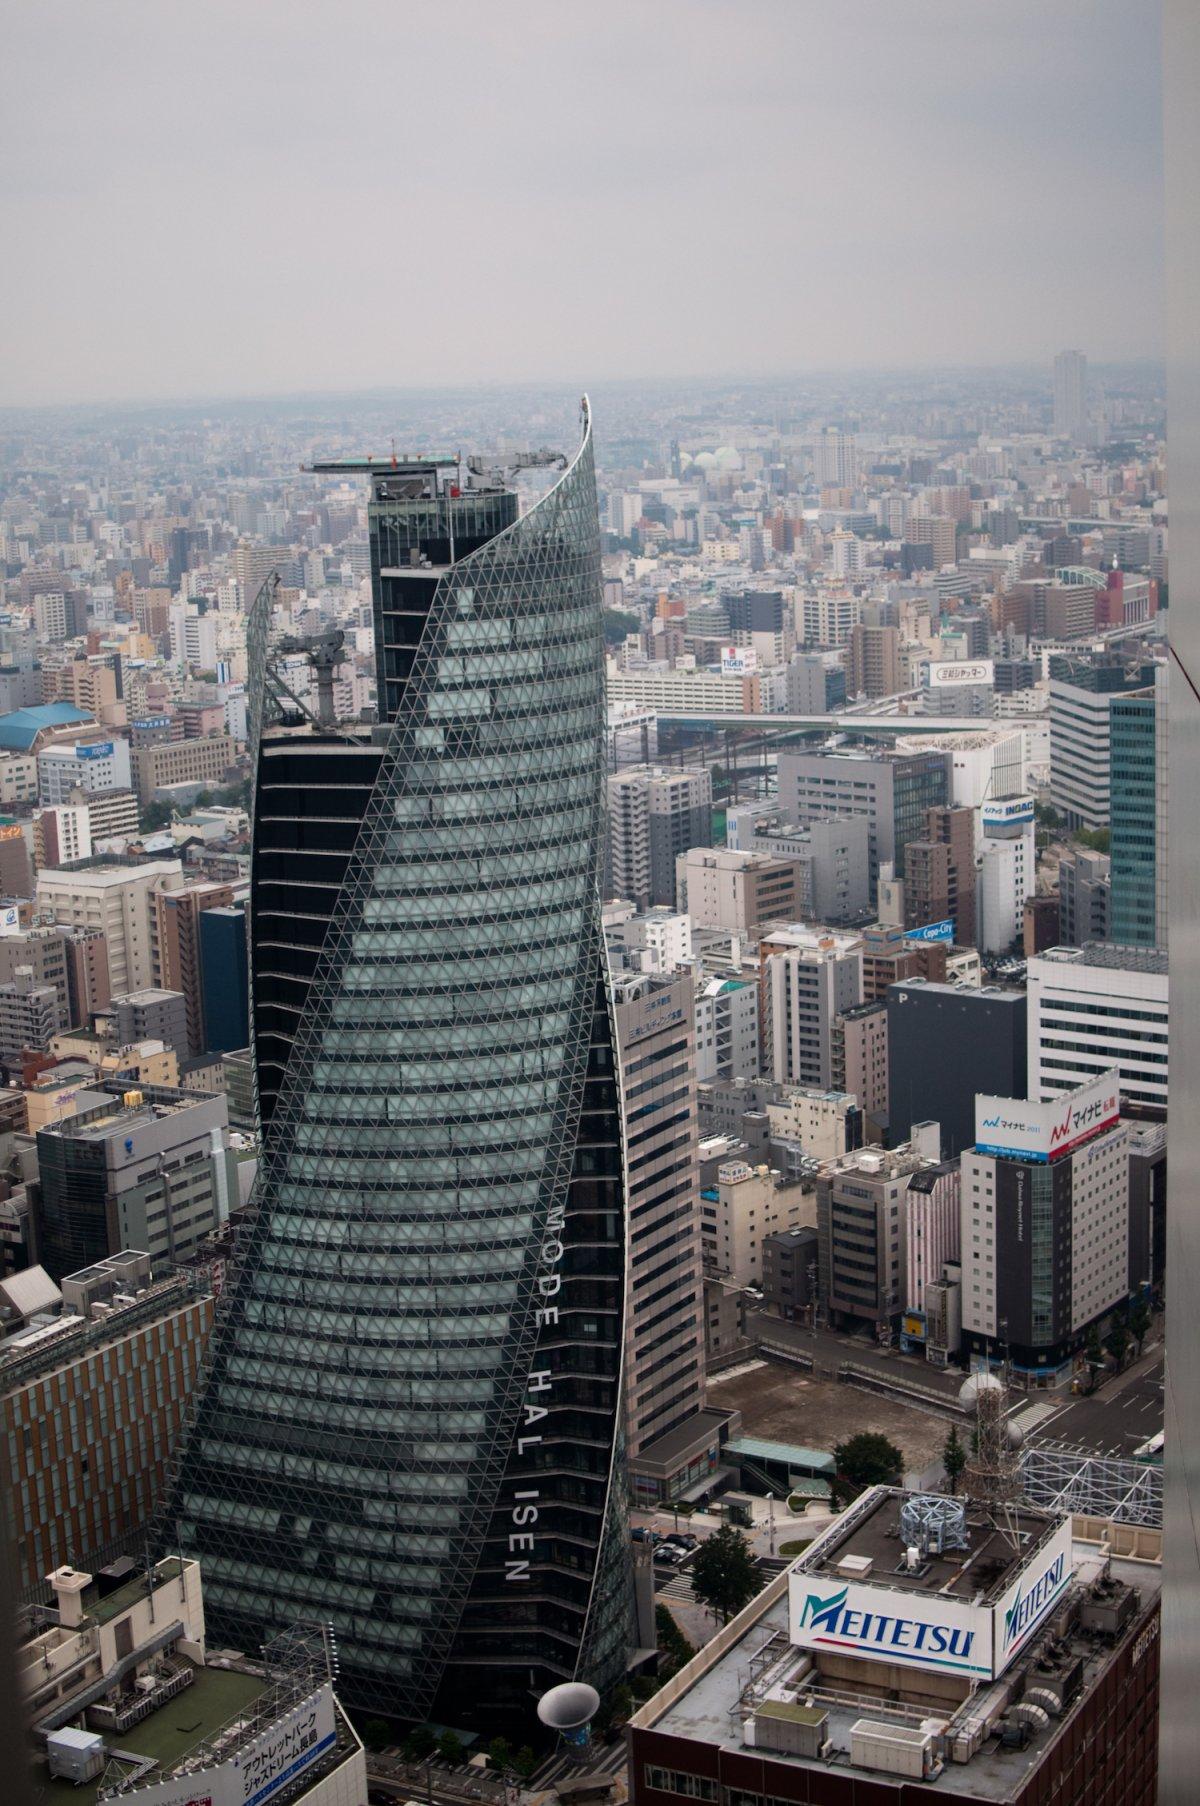 Mode Gakuen Spiral Towers (Nagoya, Япония). Проектирование — Nikken Sekkei. Высота — 170 метров. Год